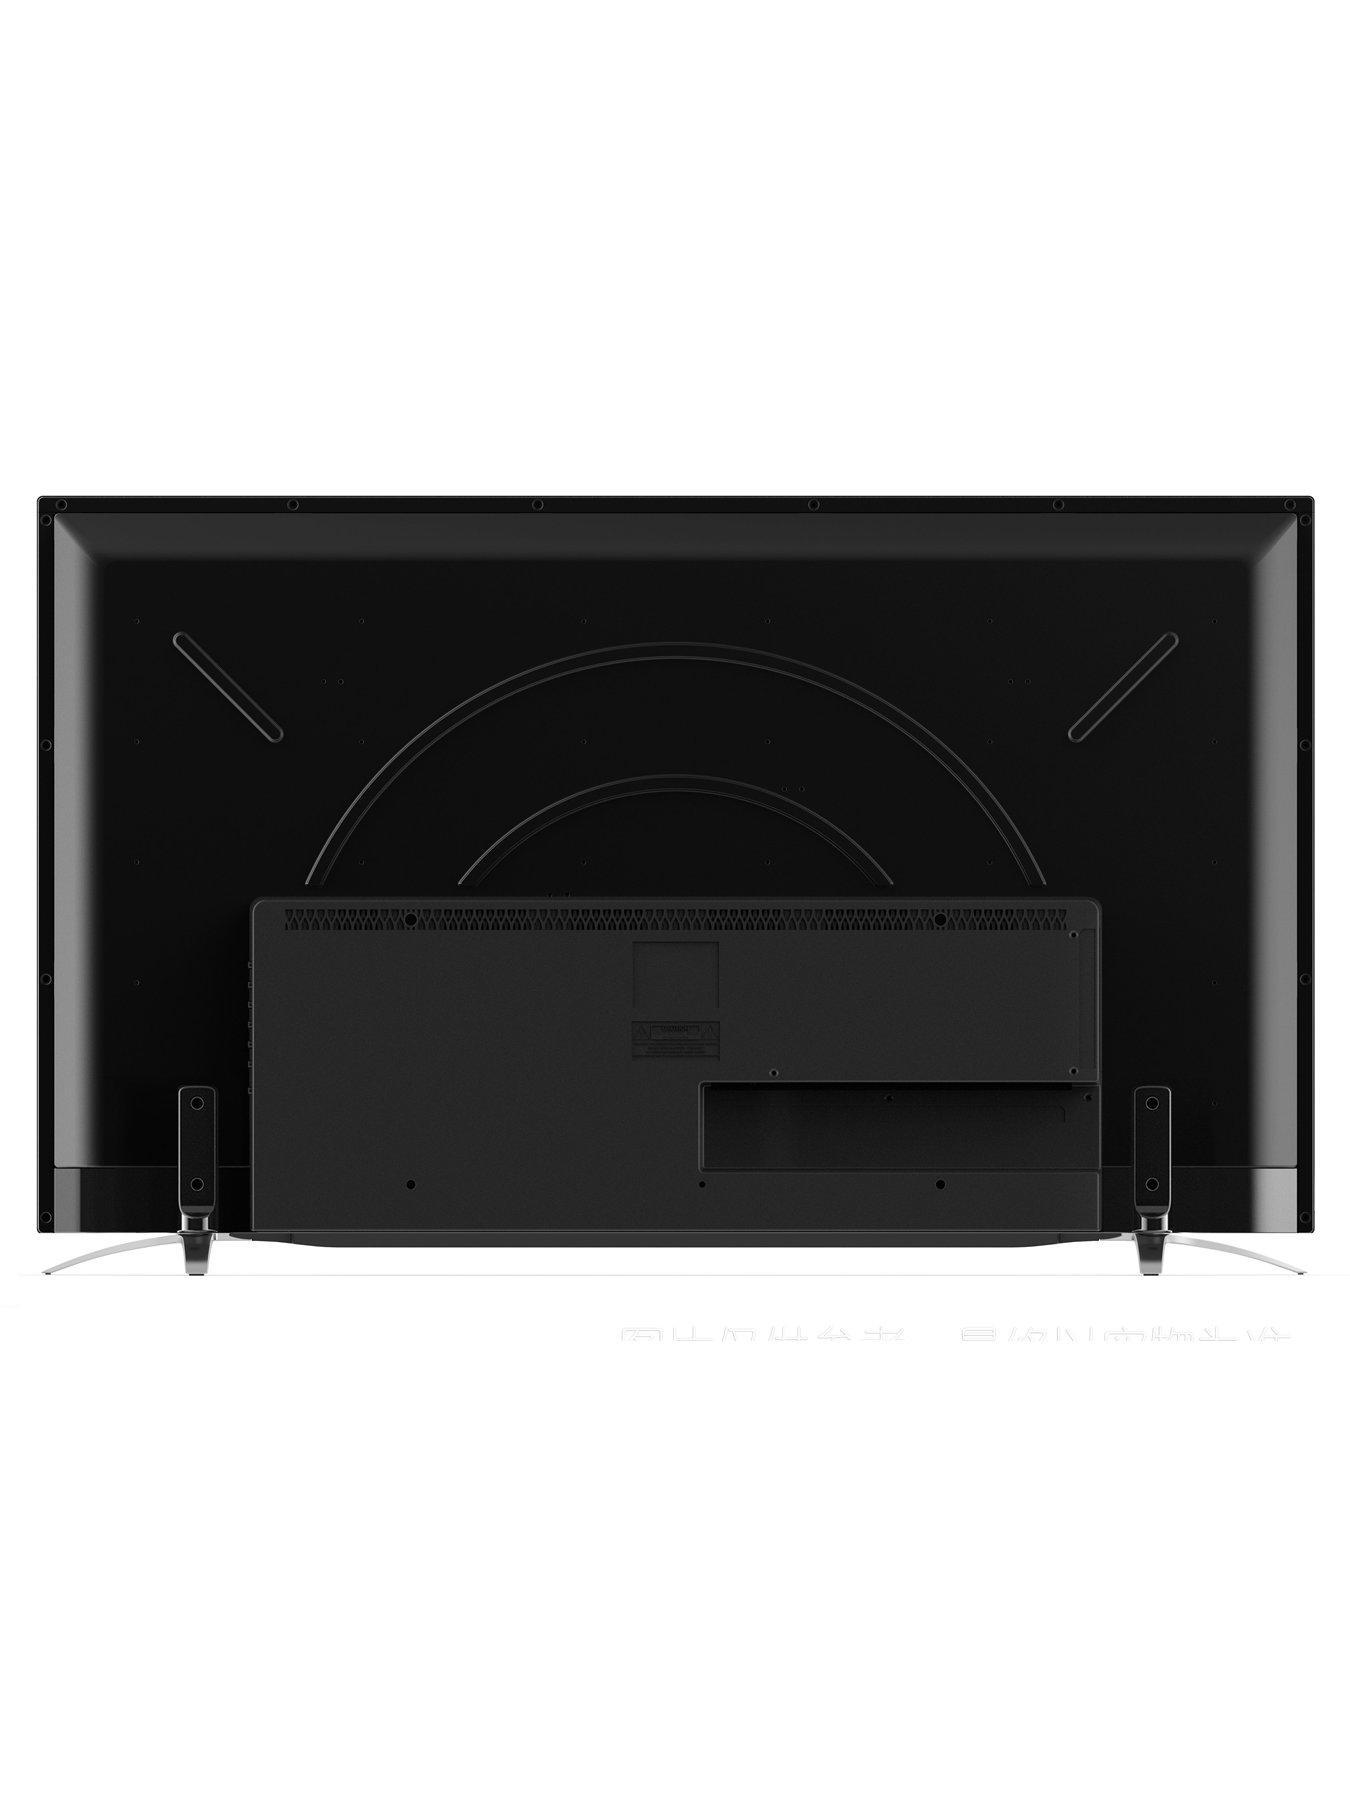 sharp 55 inch lc 55cug8052k 4k ultra hd smart led tv. sharp lc-55cug8362ks 55 inch, 4k ultra hd certified, smart tv - black. view larger inch lc 55cug8052k 4k hd led tv m